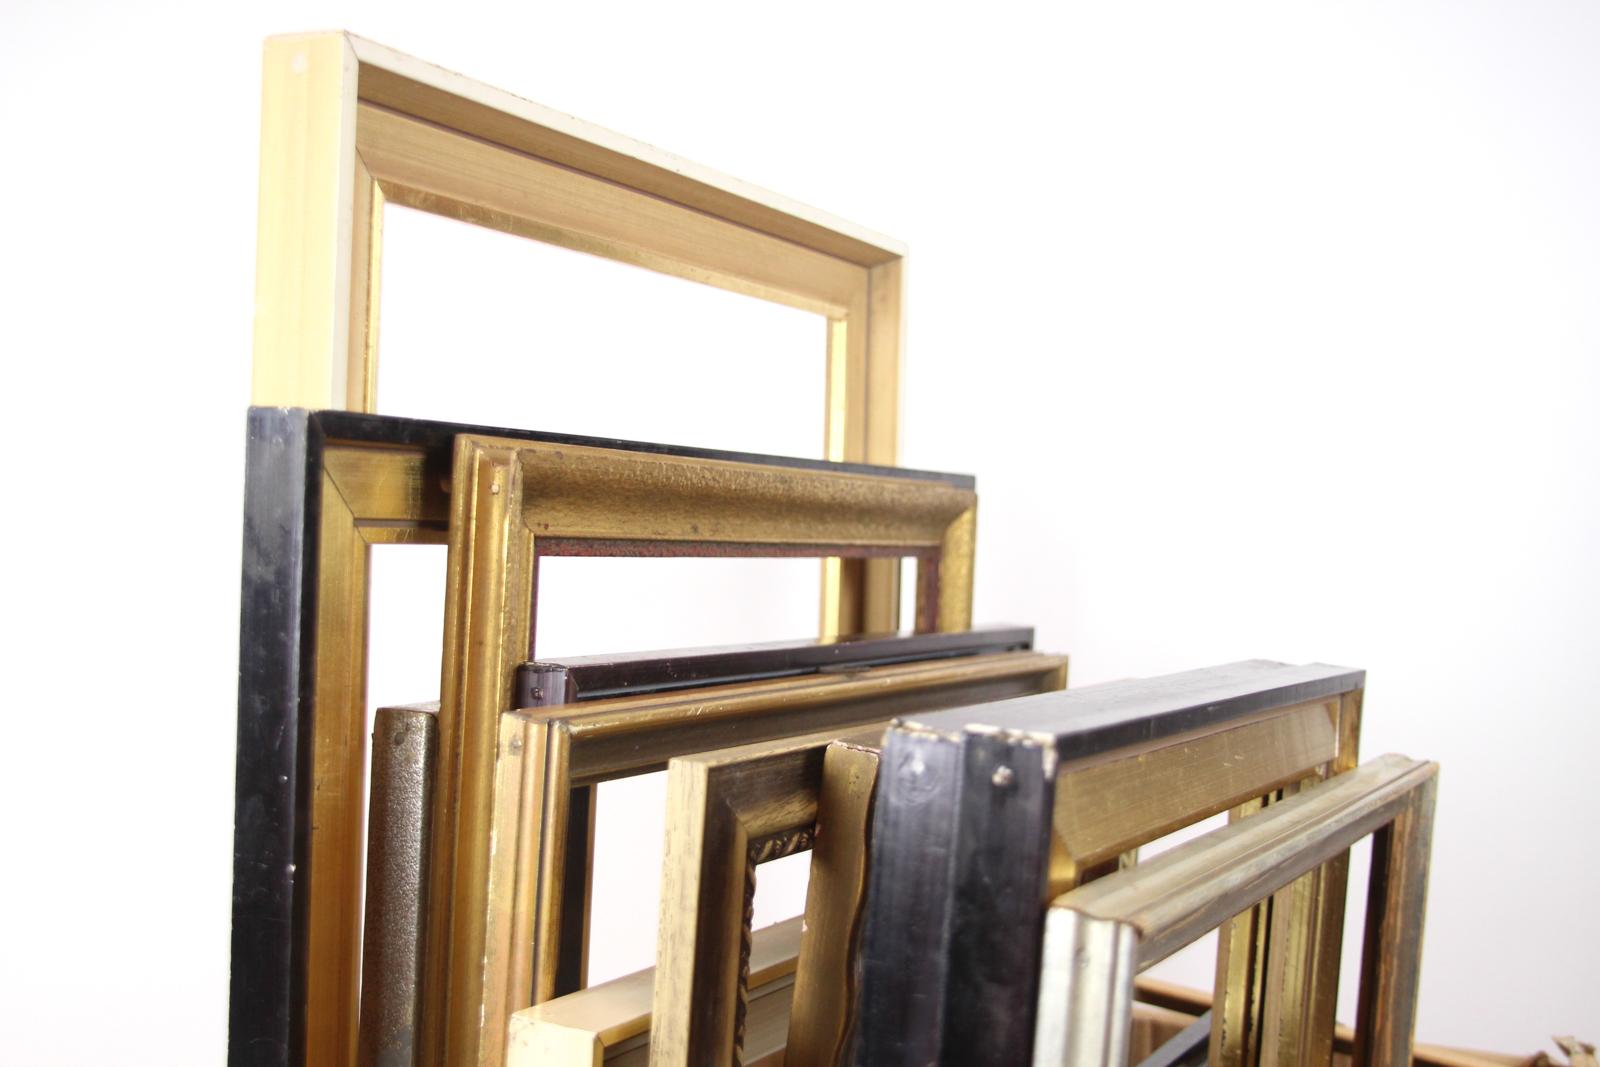 set 26 antike prunkrahmen goldfarbene bilderrahmen stuckrahmen diverse gr en ebay. Black Bedroom Furniture Sets. Home Design Ideas